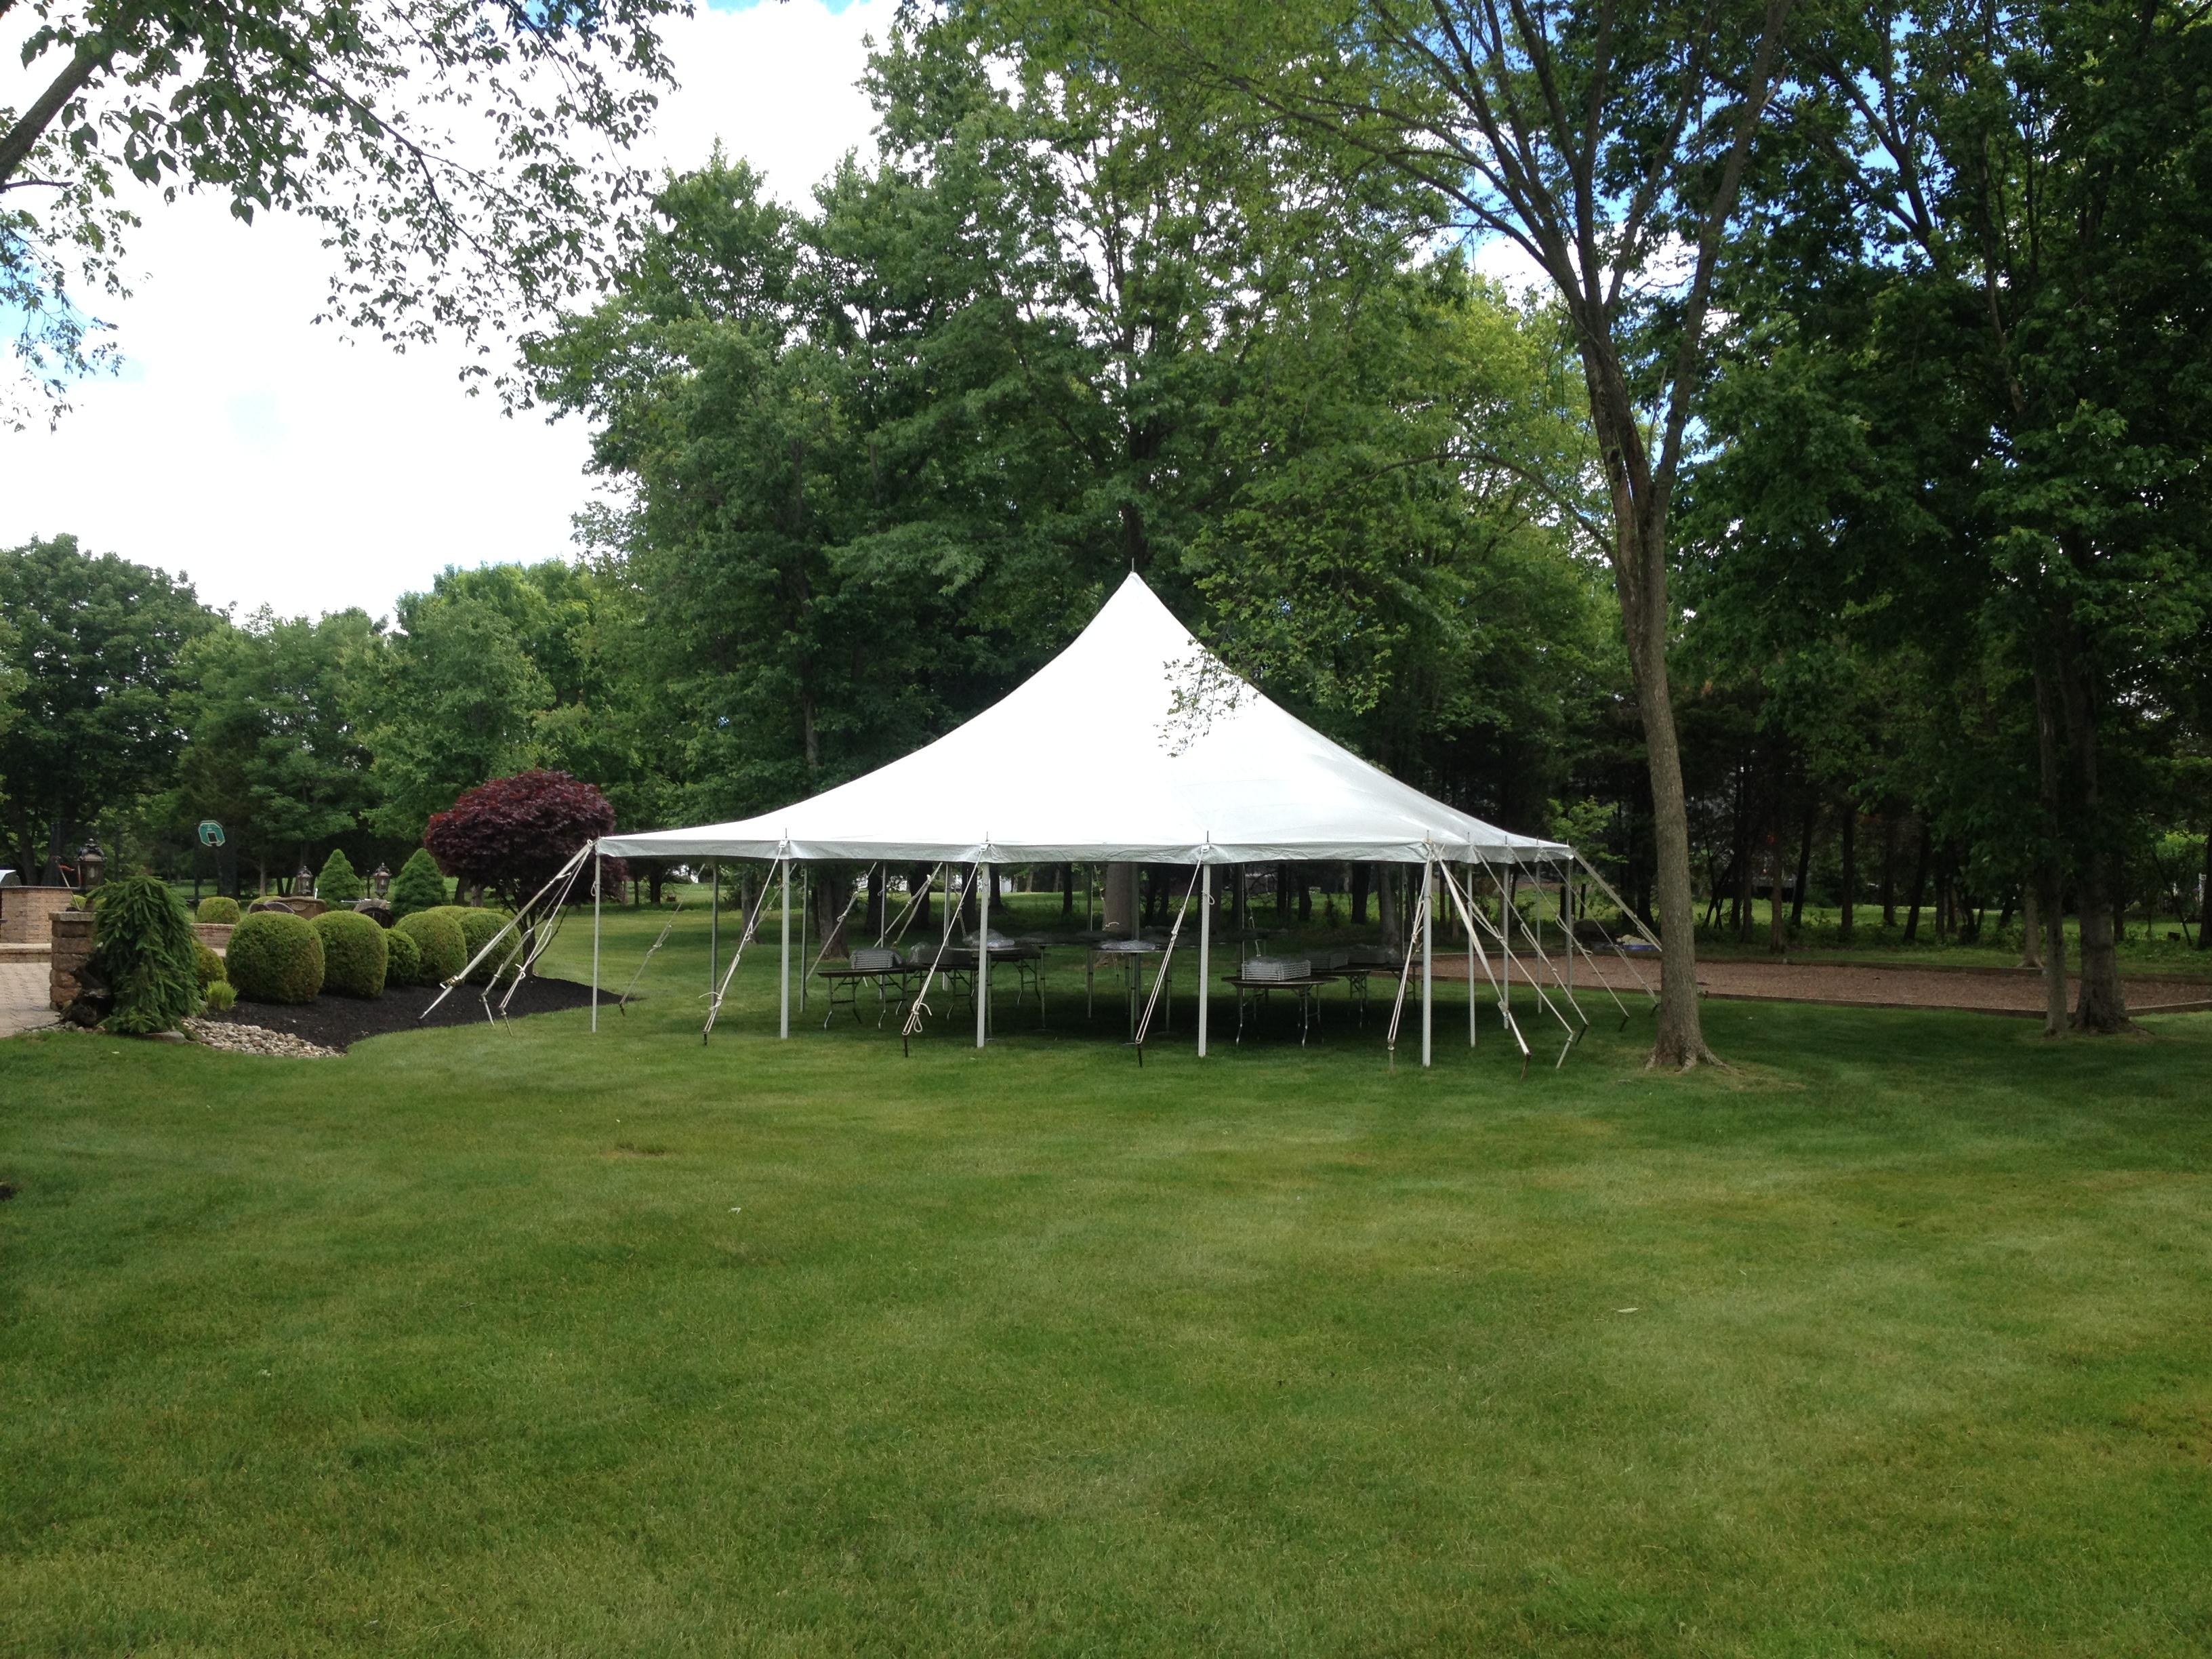 30 x 30 High Peak Pole Tent & Central Jersey Tent Rentals - Photos